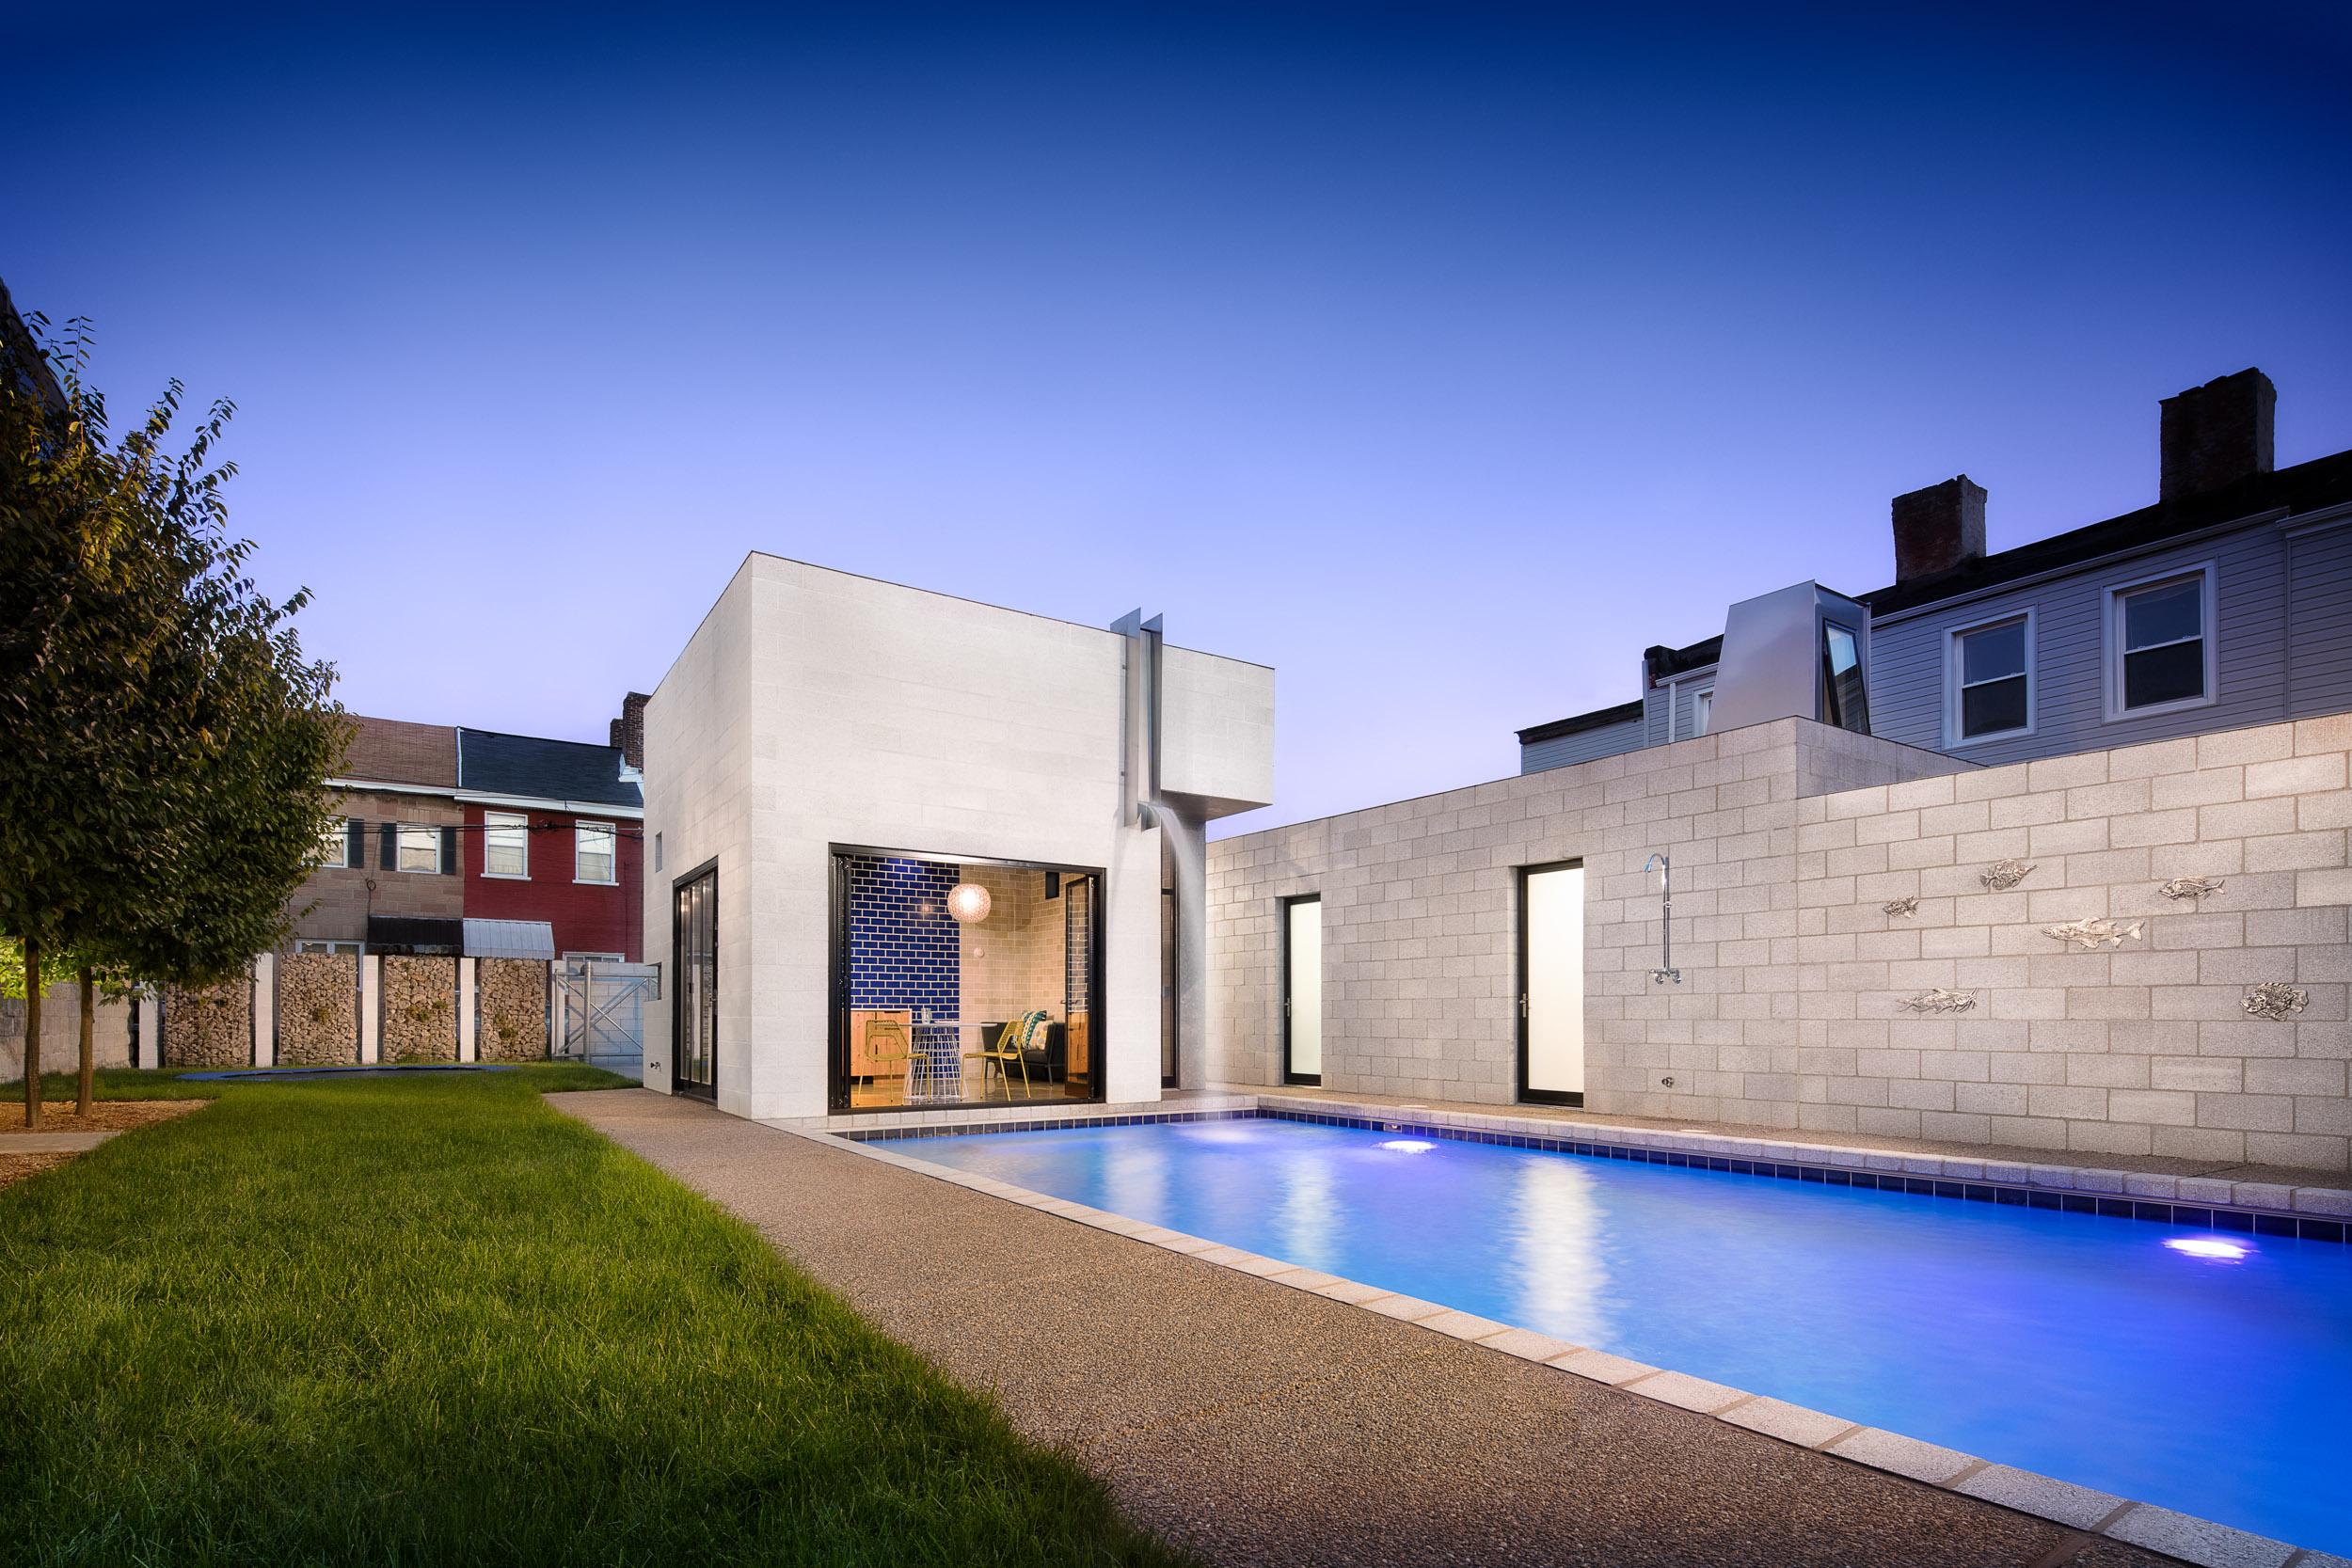 pool_pavilion_pittsburgh_design_poolhouse-13.jpg